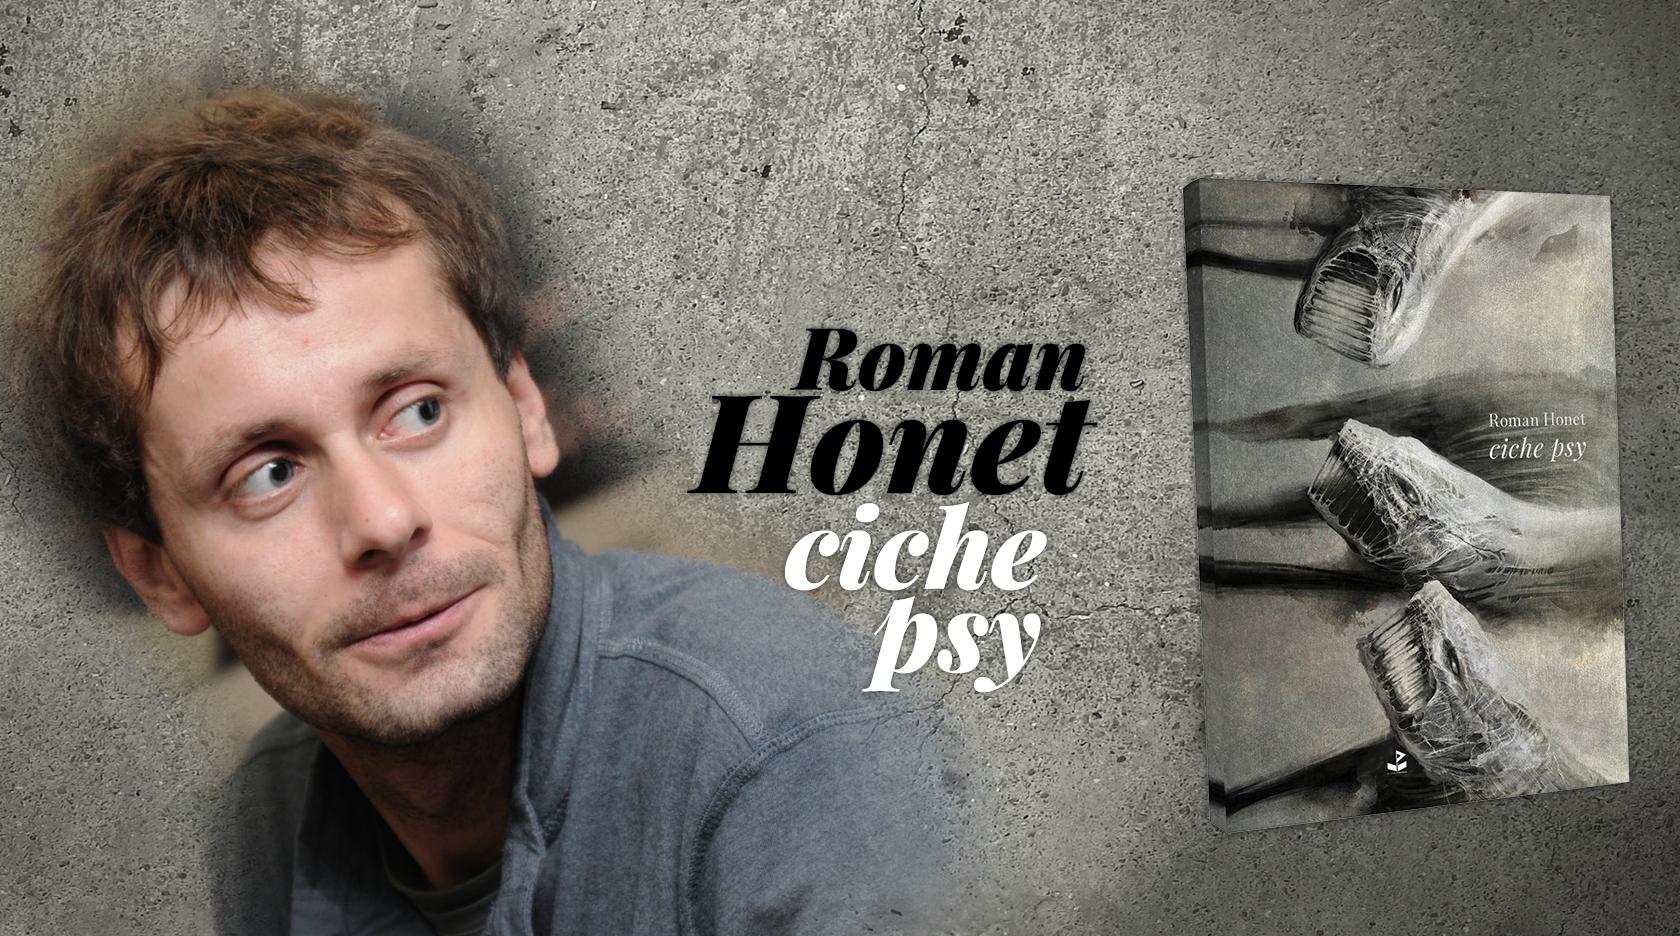 BL Img 2017.08.21 Roman HONET ciche psy_www_top